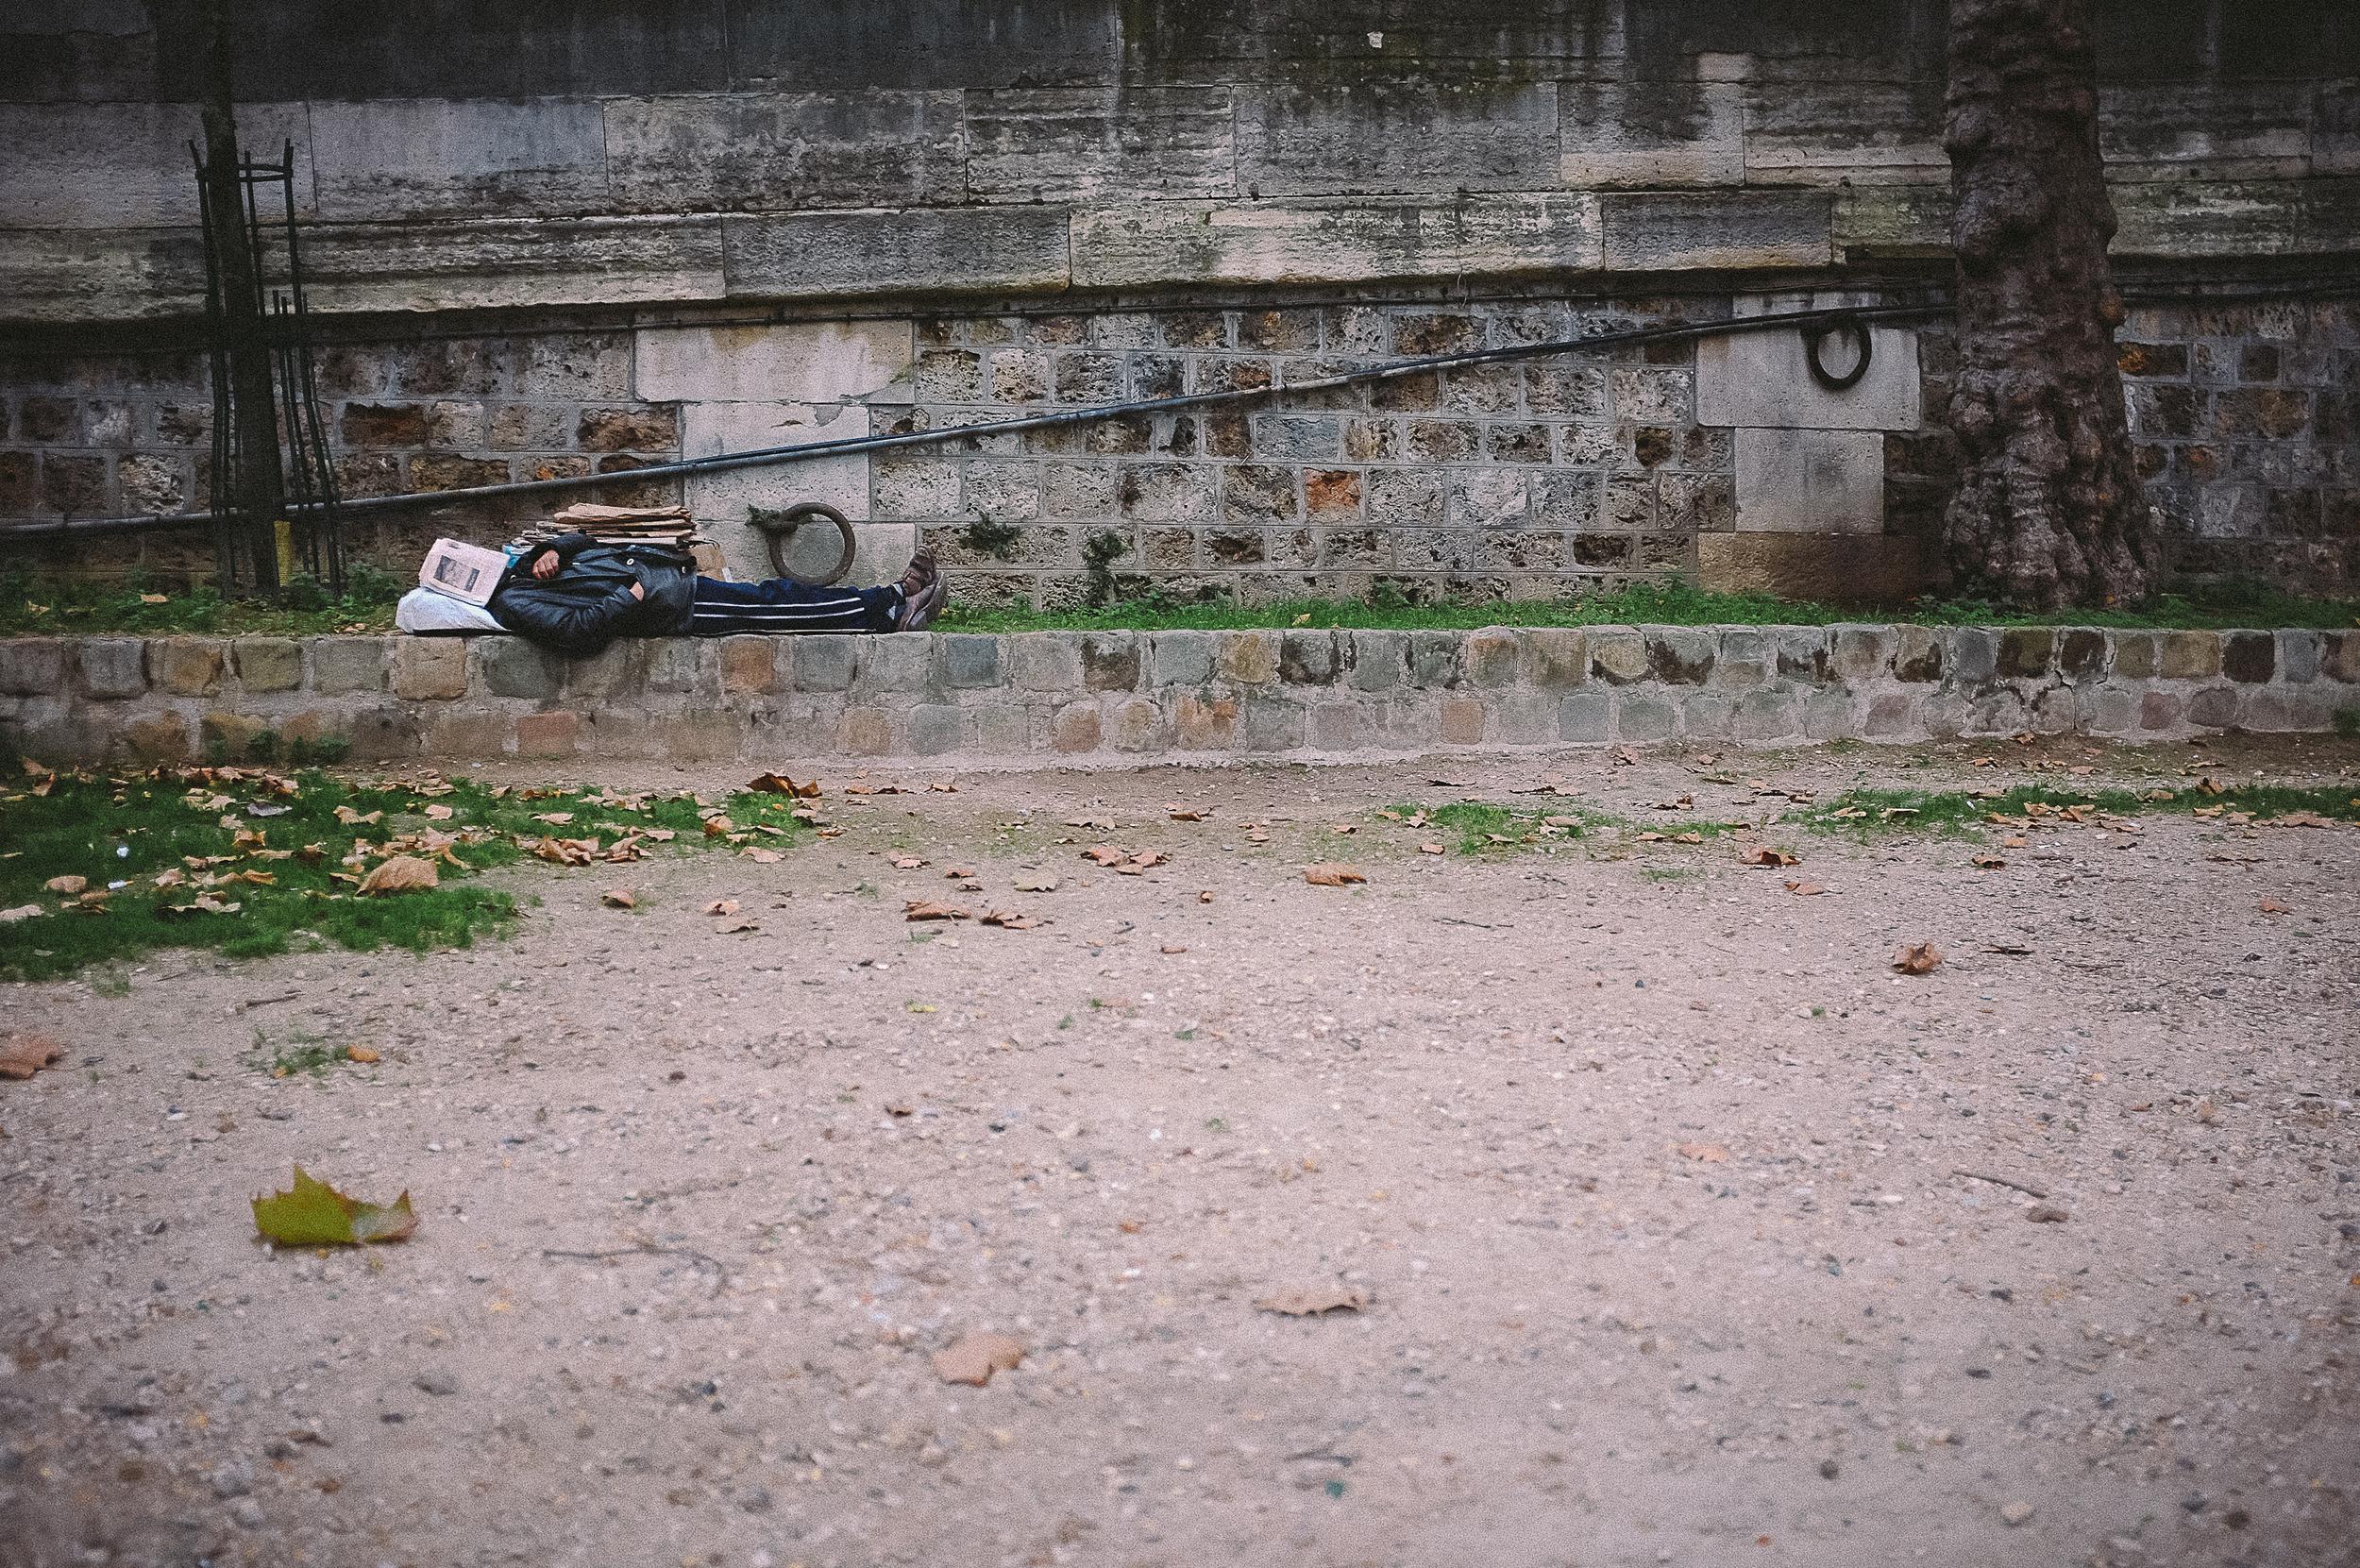 fujix100 street photography-35.jpg